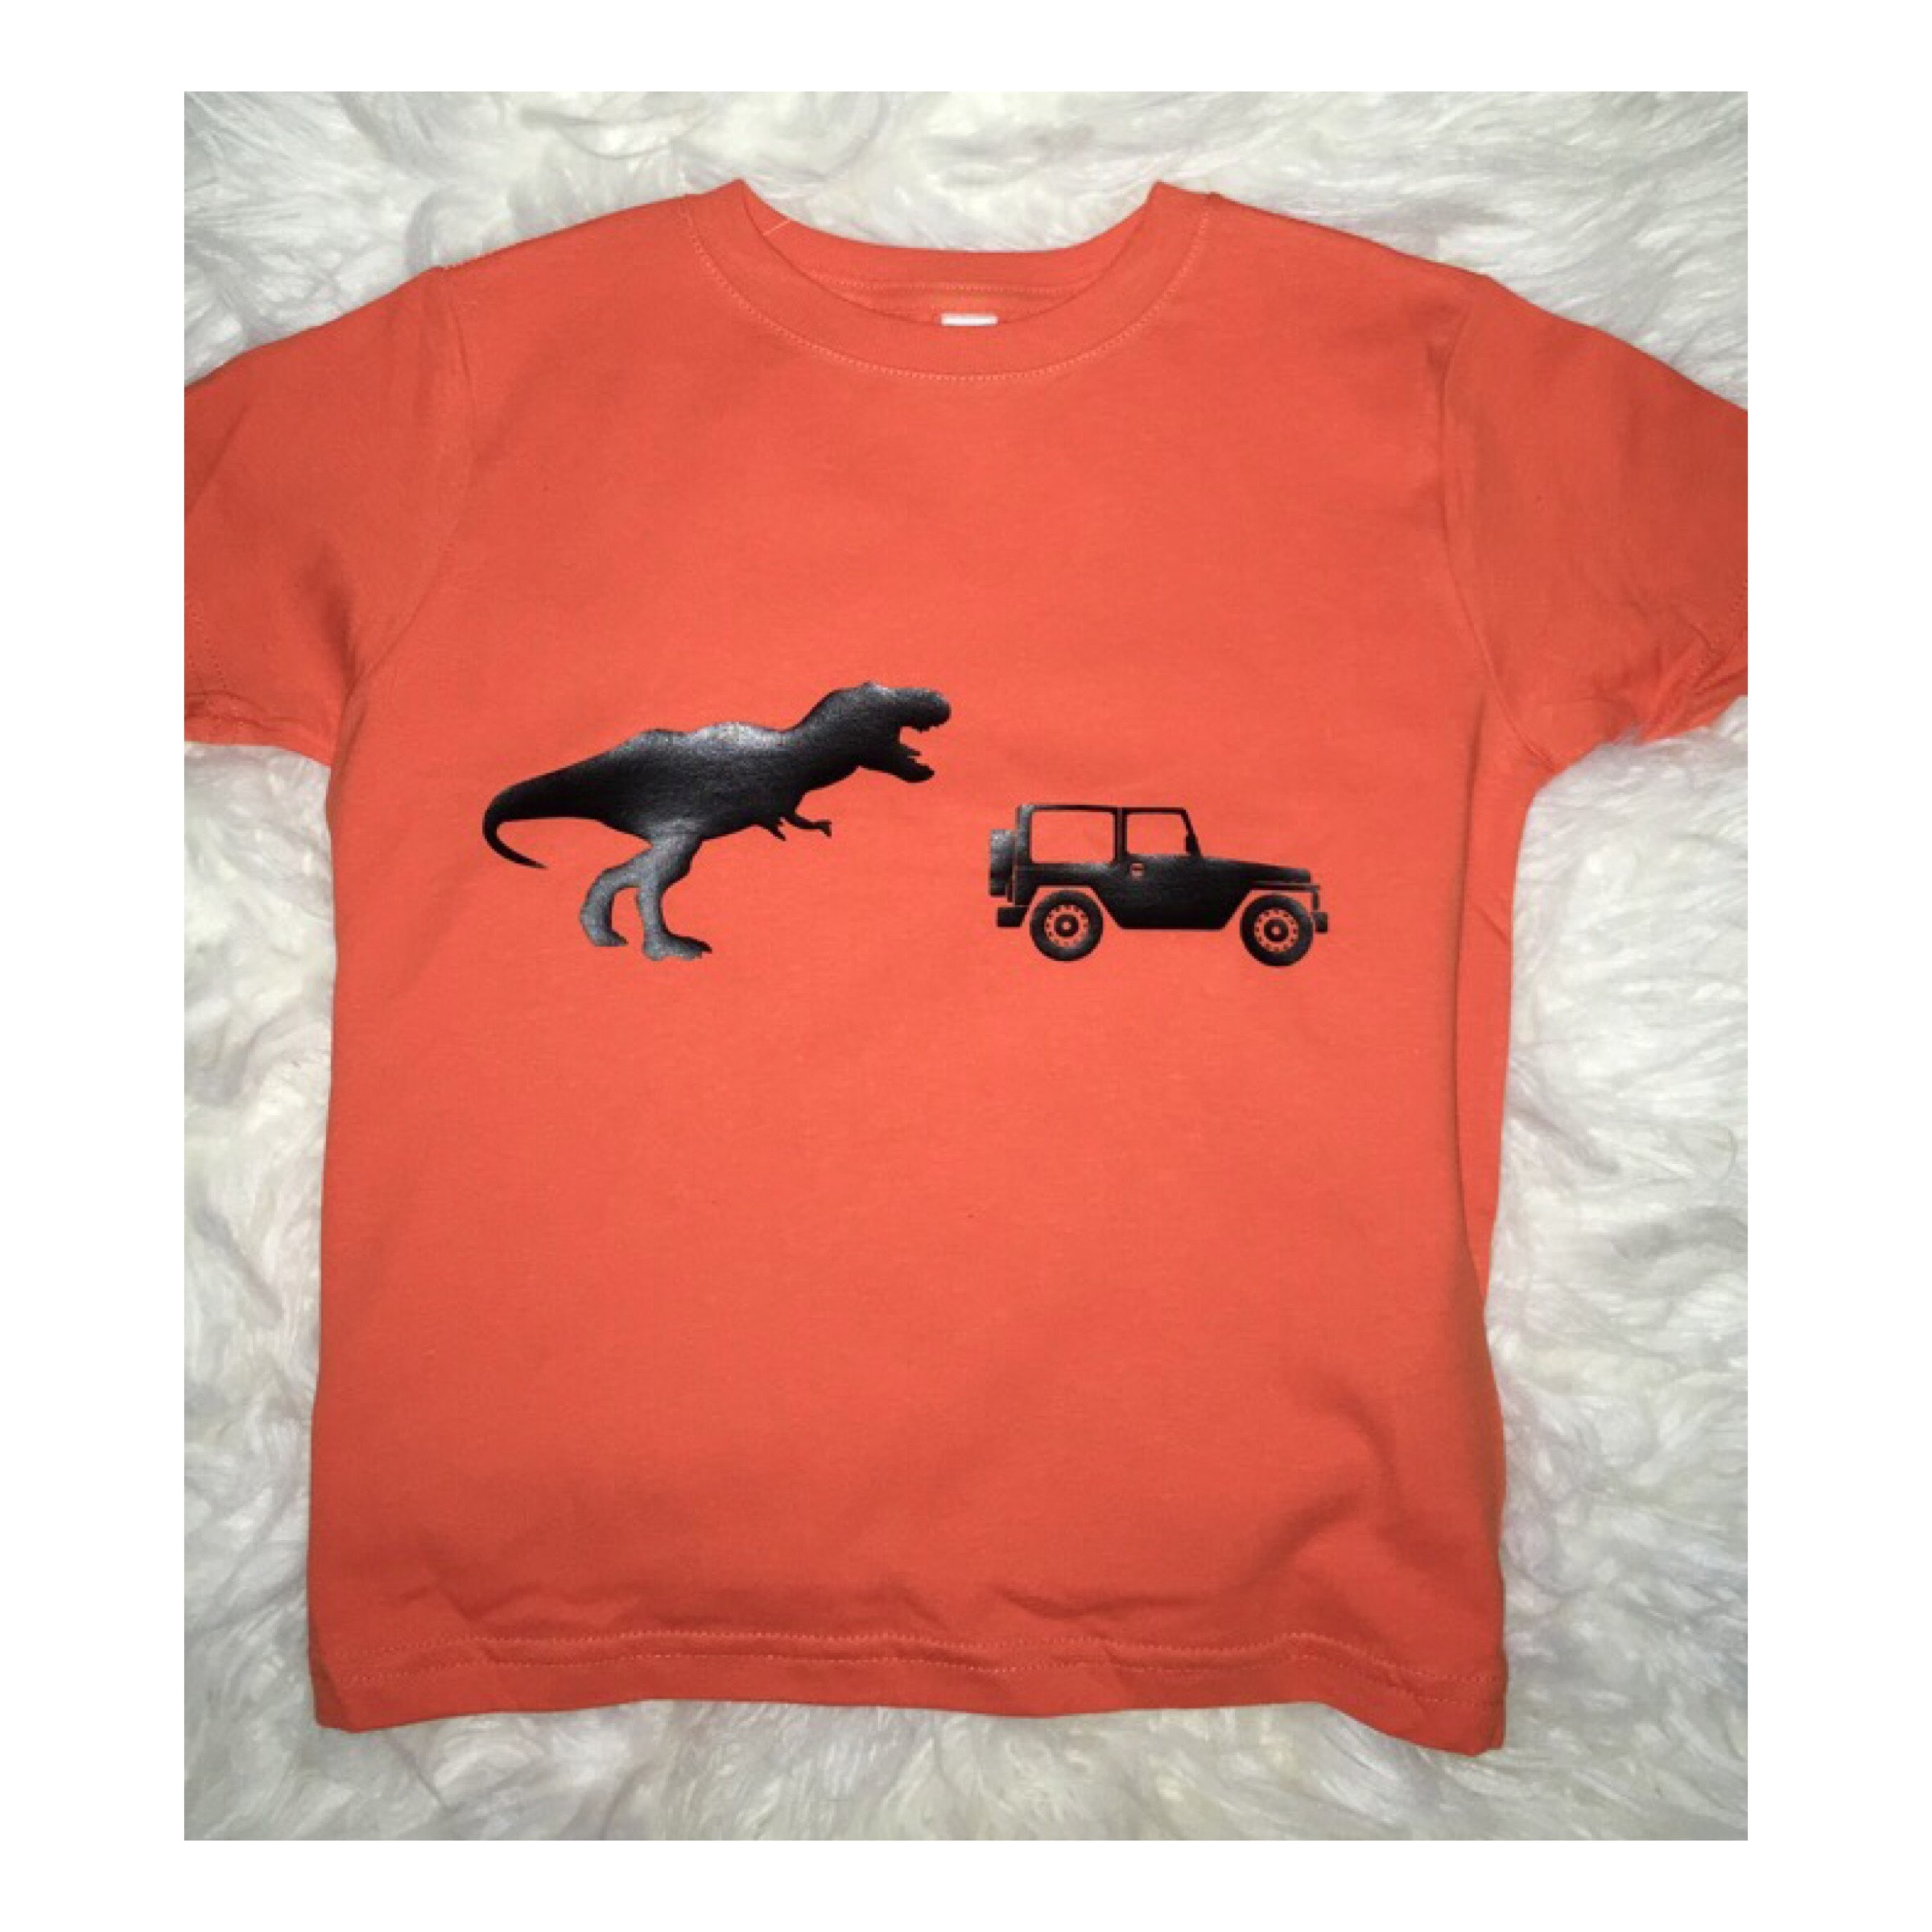 Rabbit Skins 3321 customer review by  Kids shirt